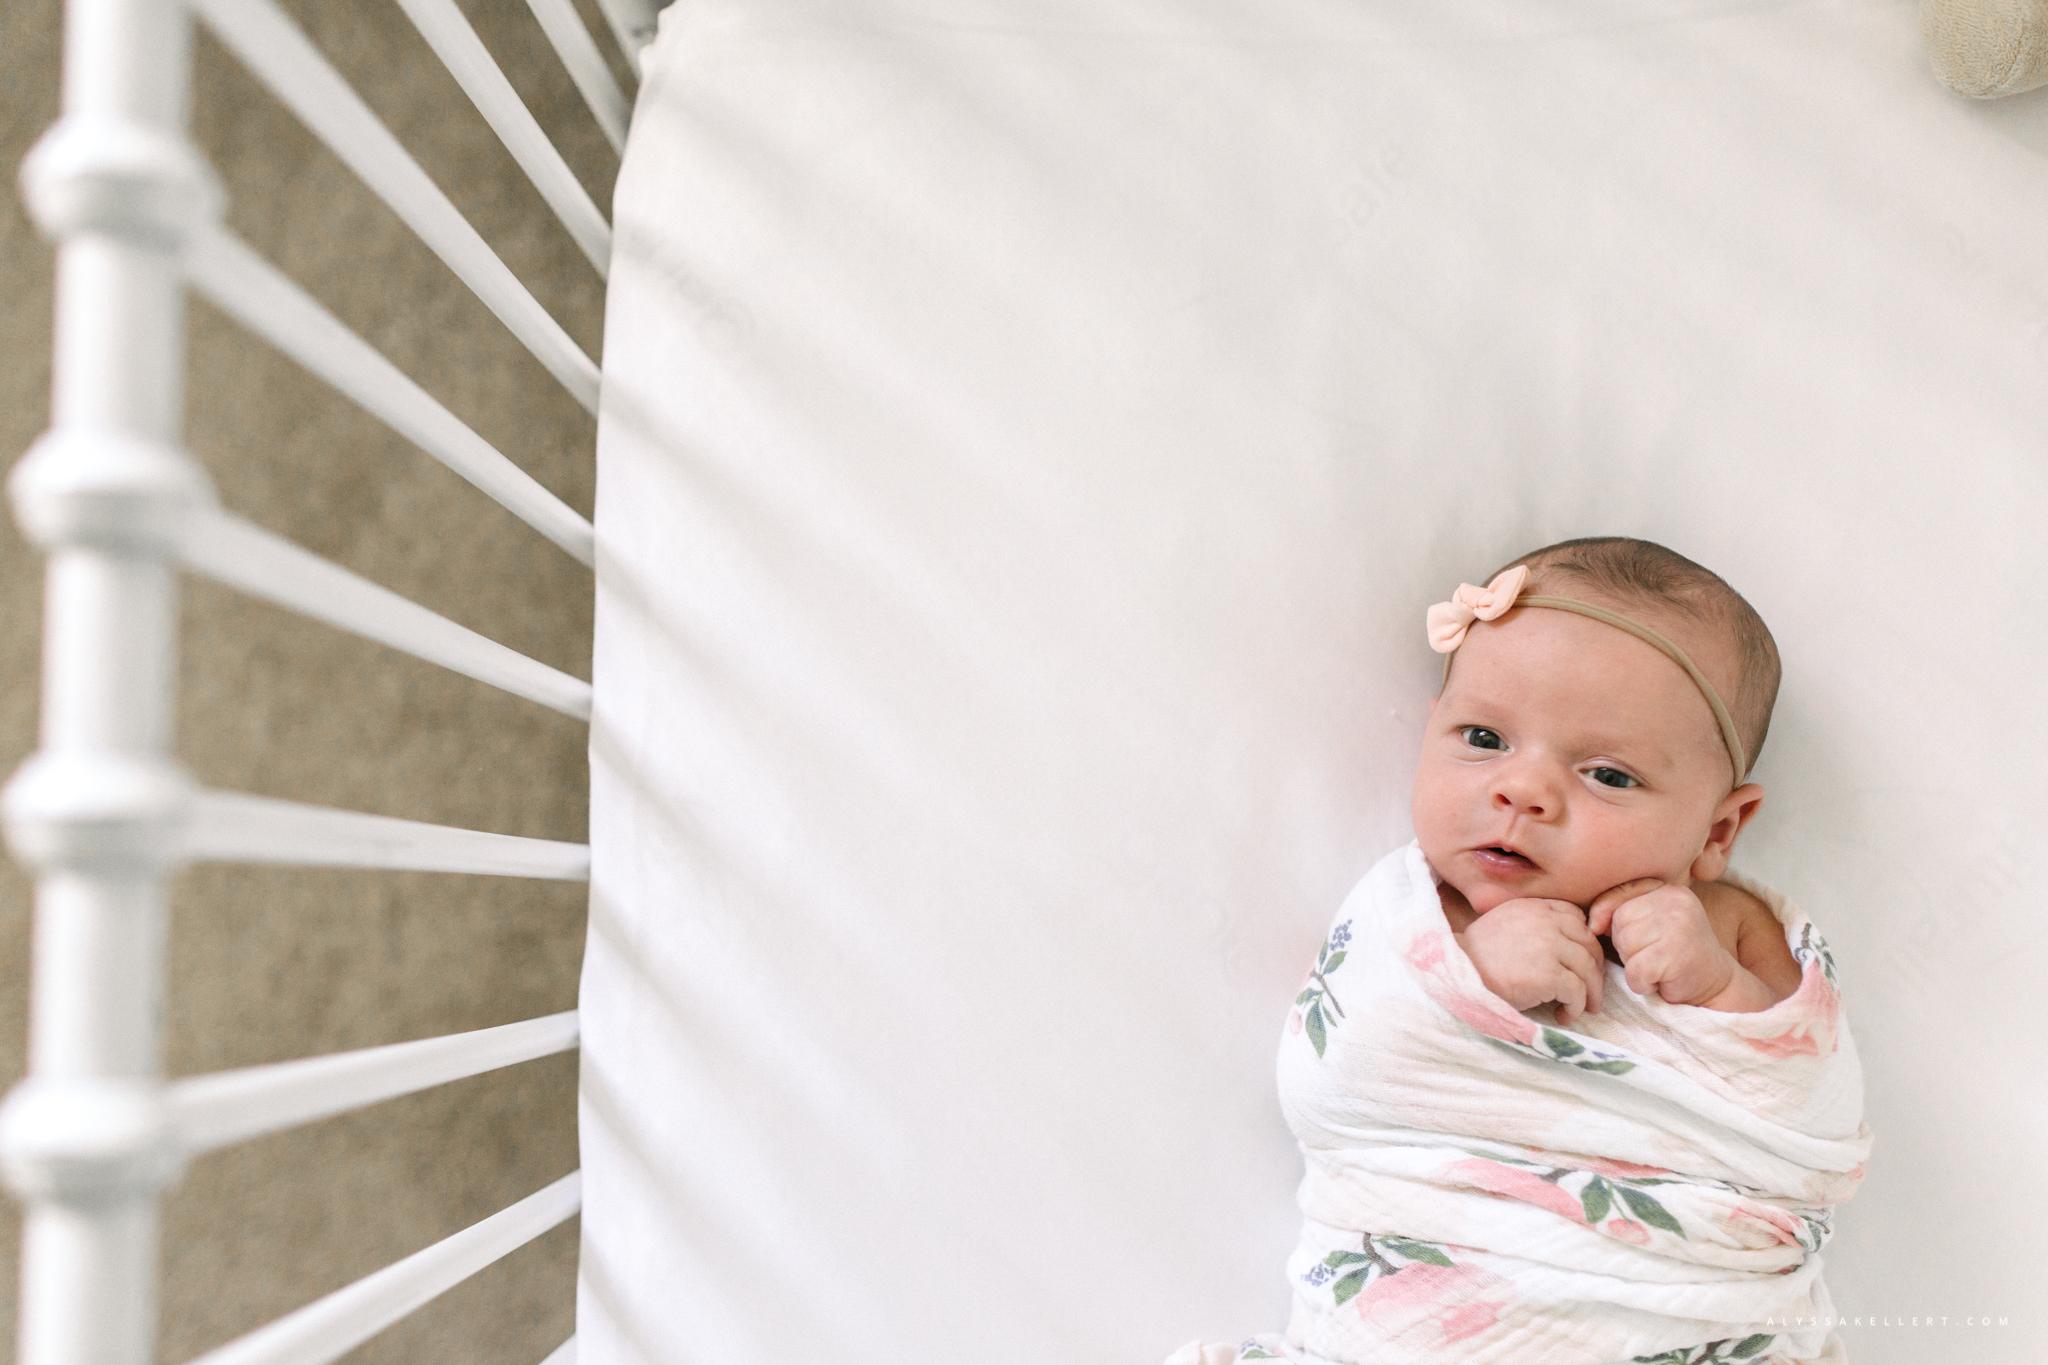 baby girl lying in crib during newborn photo session